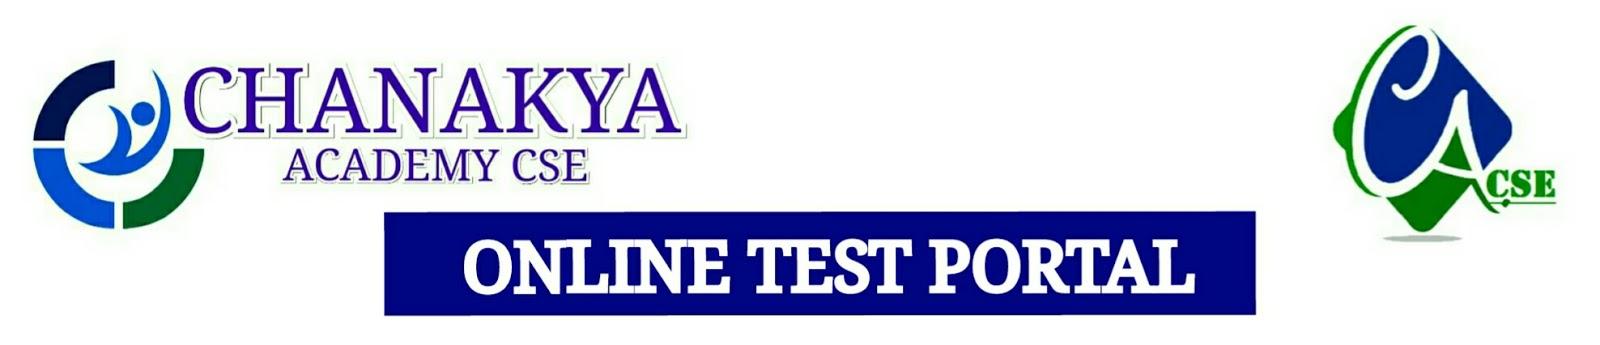 OnLine Test Cafe - CHANAKYA ACADEMY CSE : SBI | IBPS PO/ CLERK | SSC